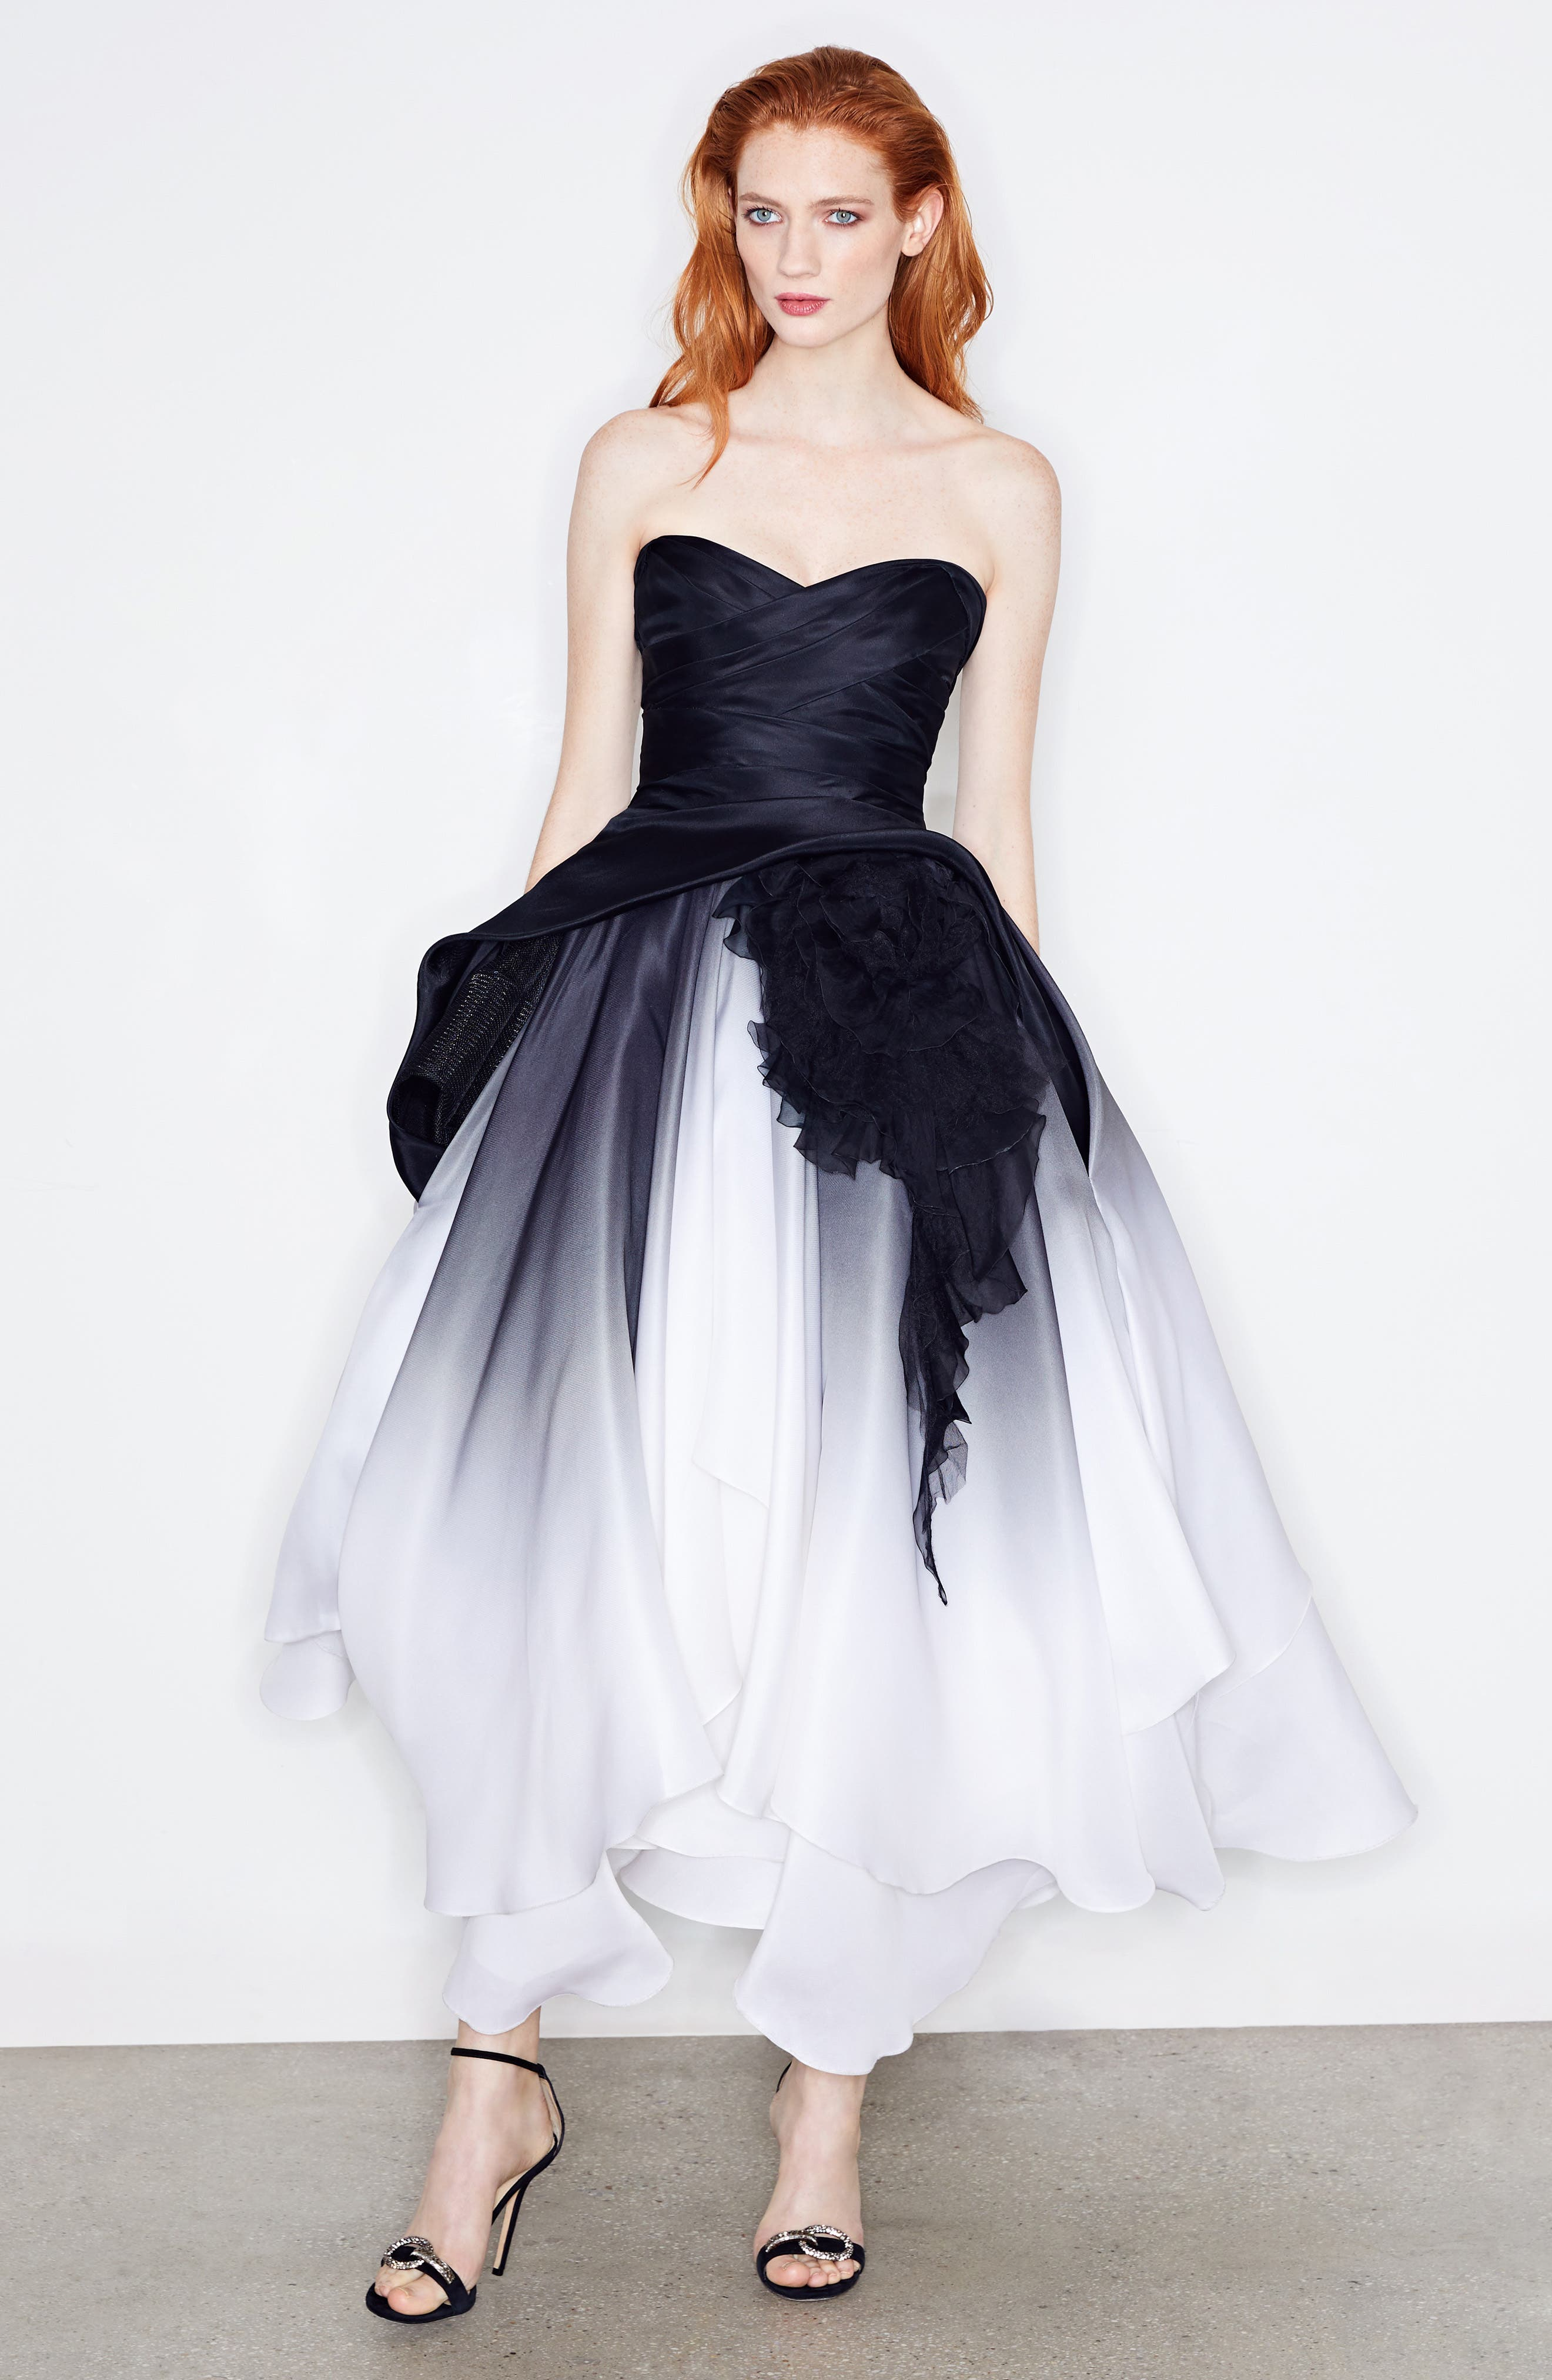 Ombré Strapless Tea Length Dress,                             Alternate thumbnail 6, color,                             001